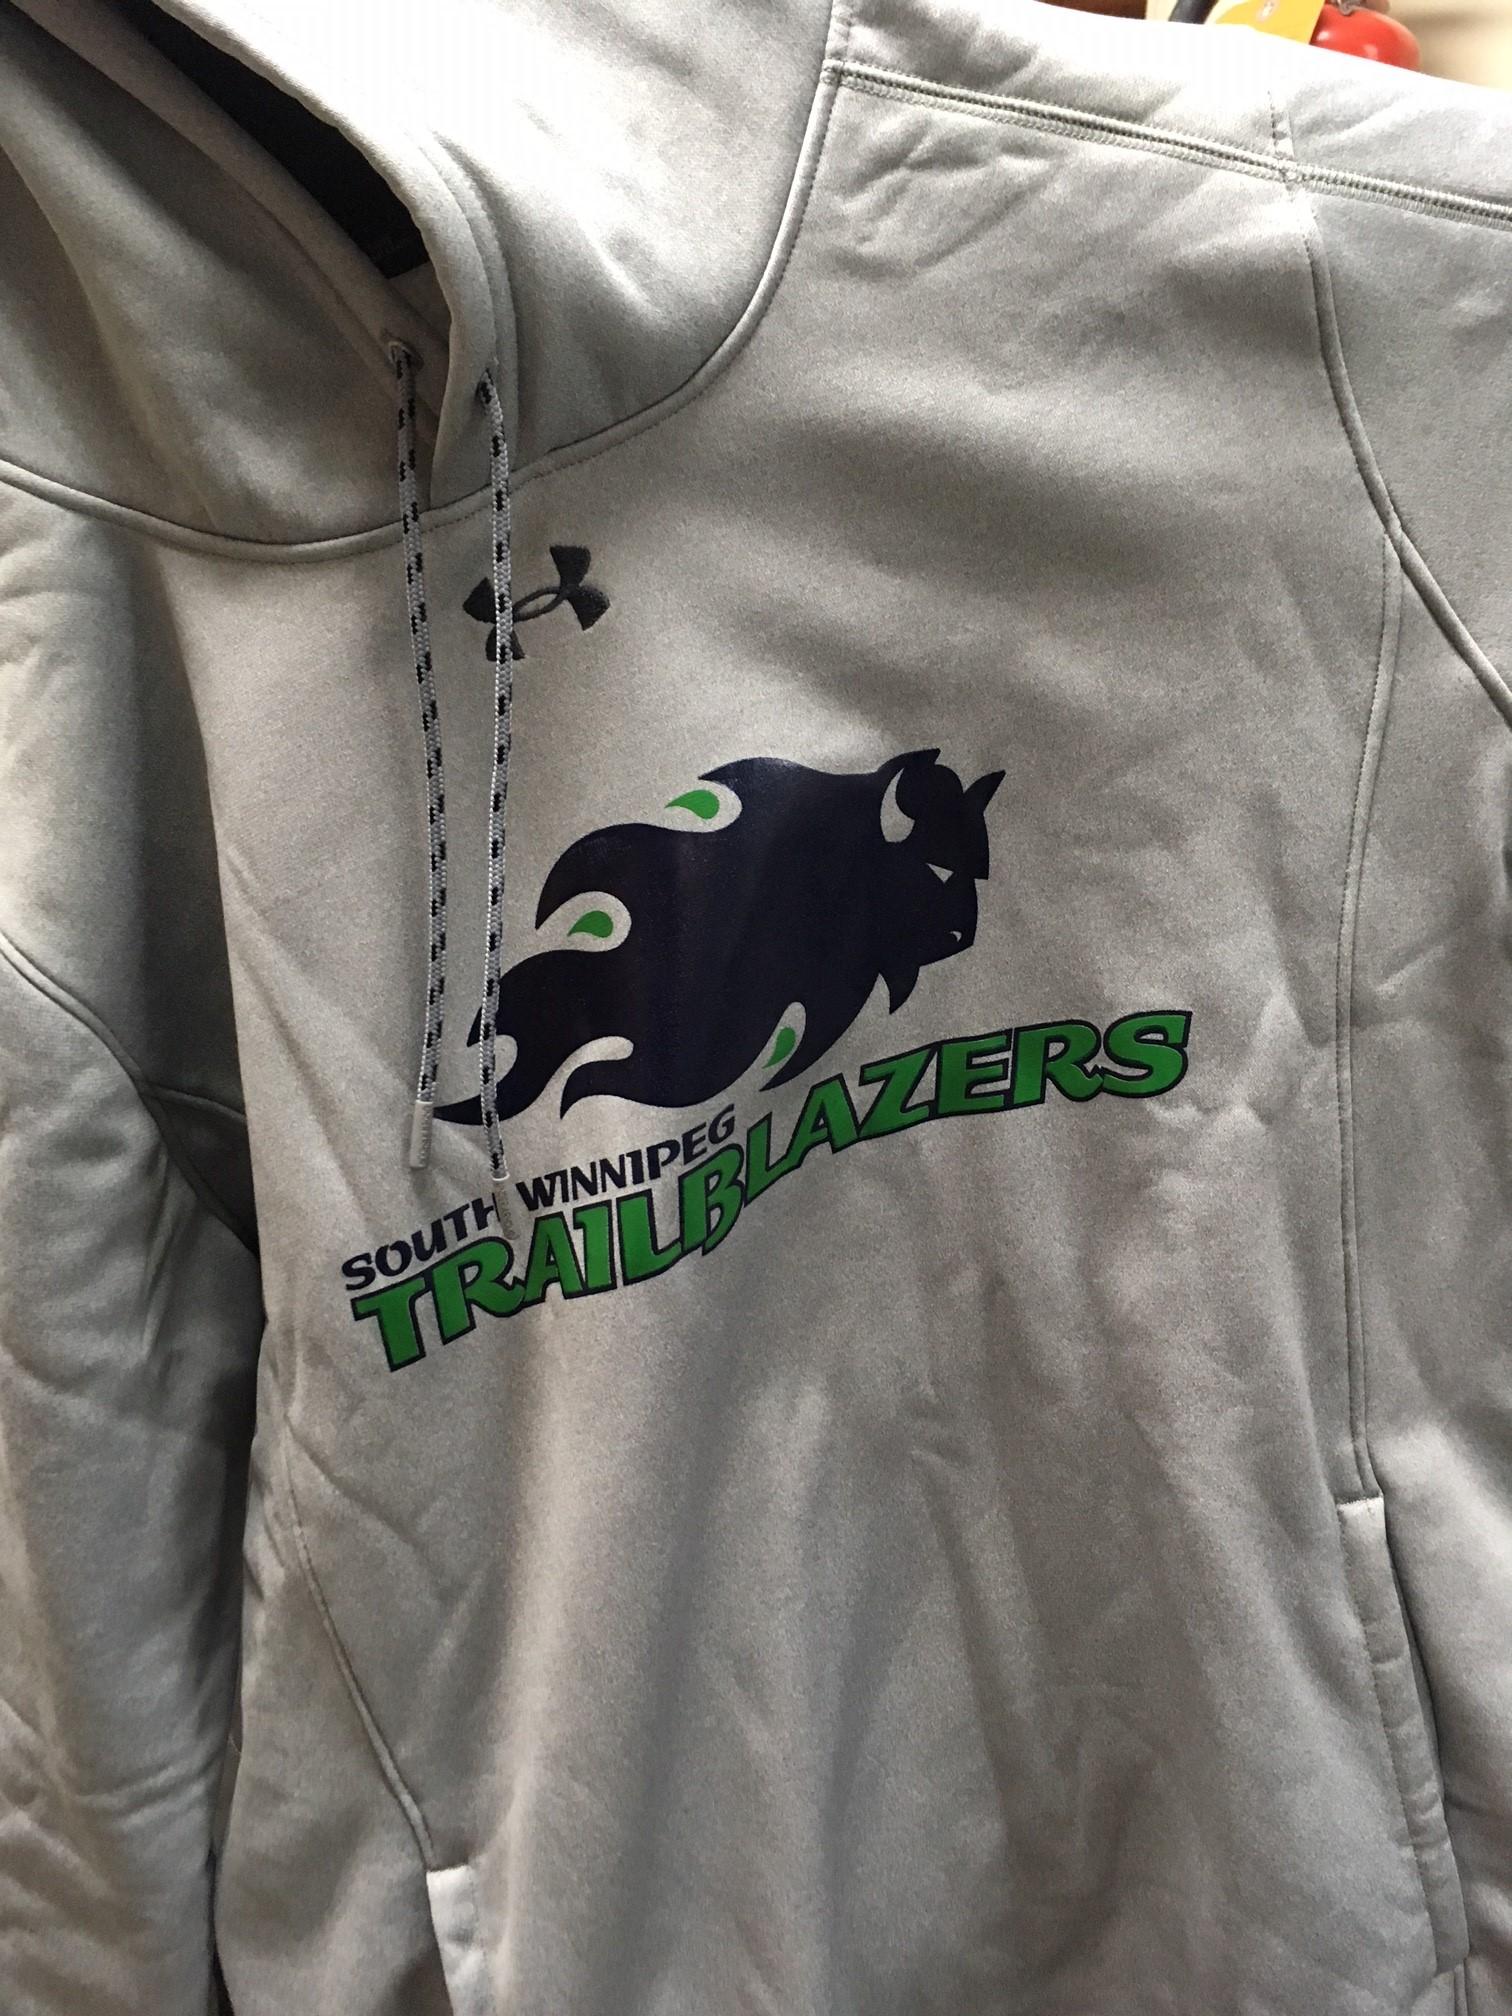 Trailblazer Wear South Winnipeg Community Centres